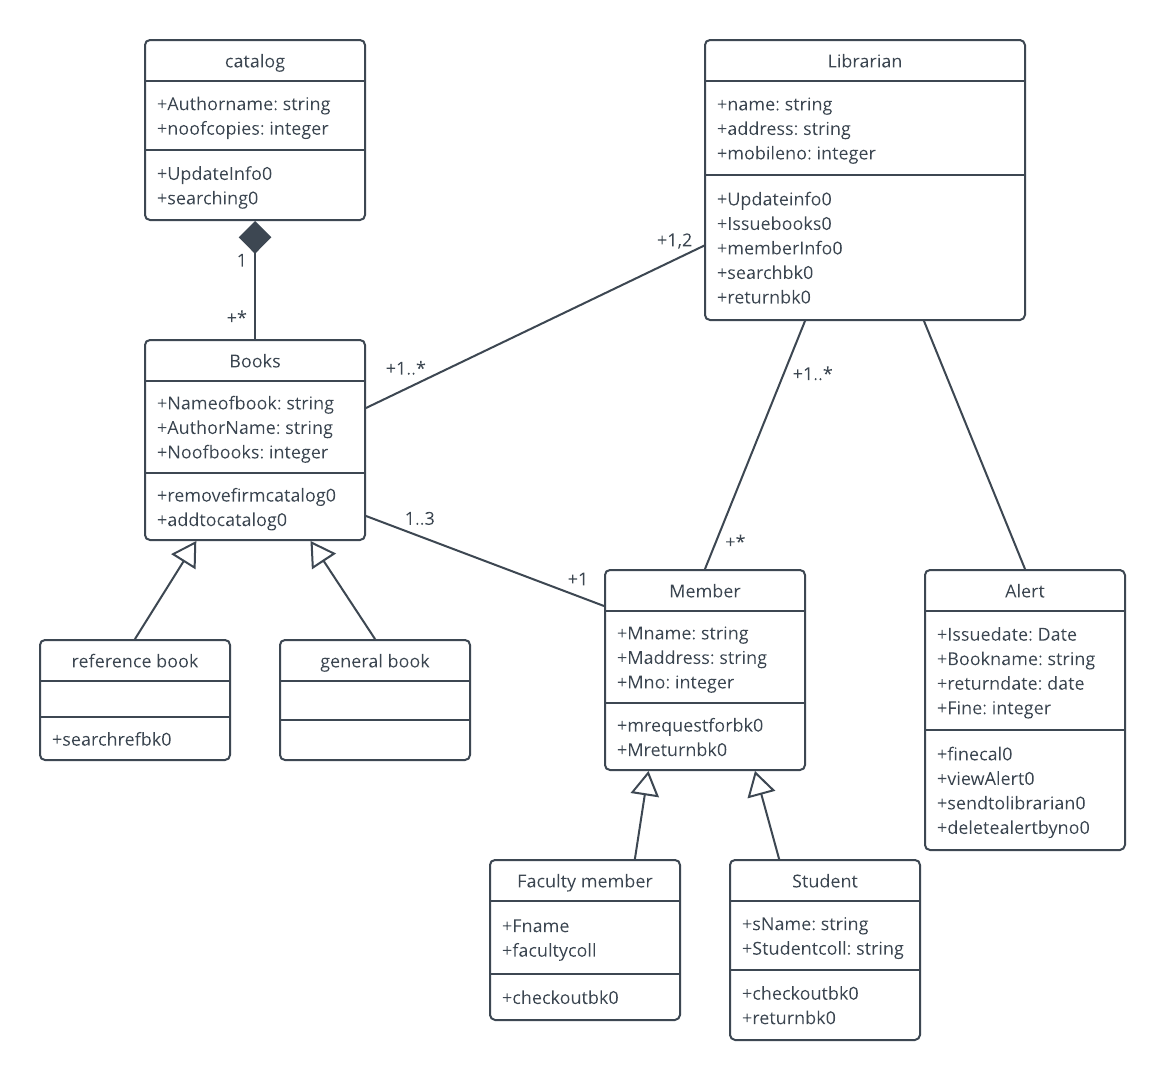 library management system uml class diagram template [ 1165 x 1080 Pixel ]